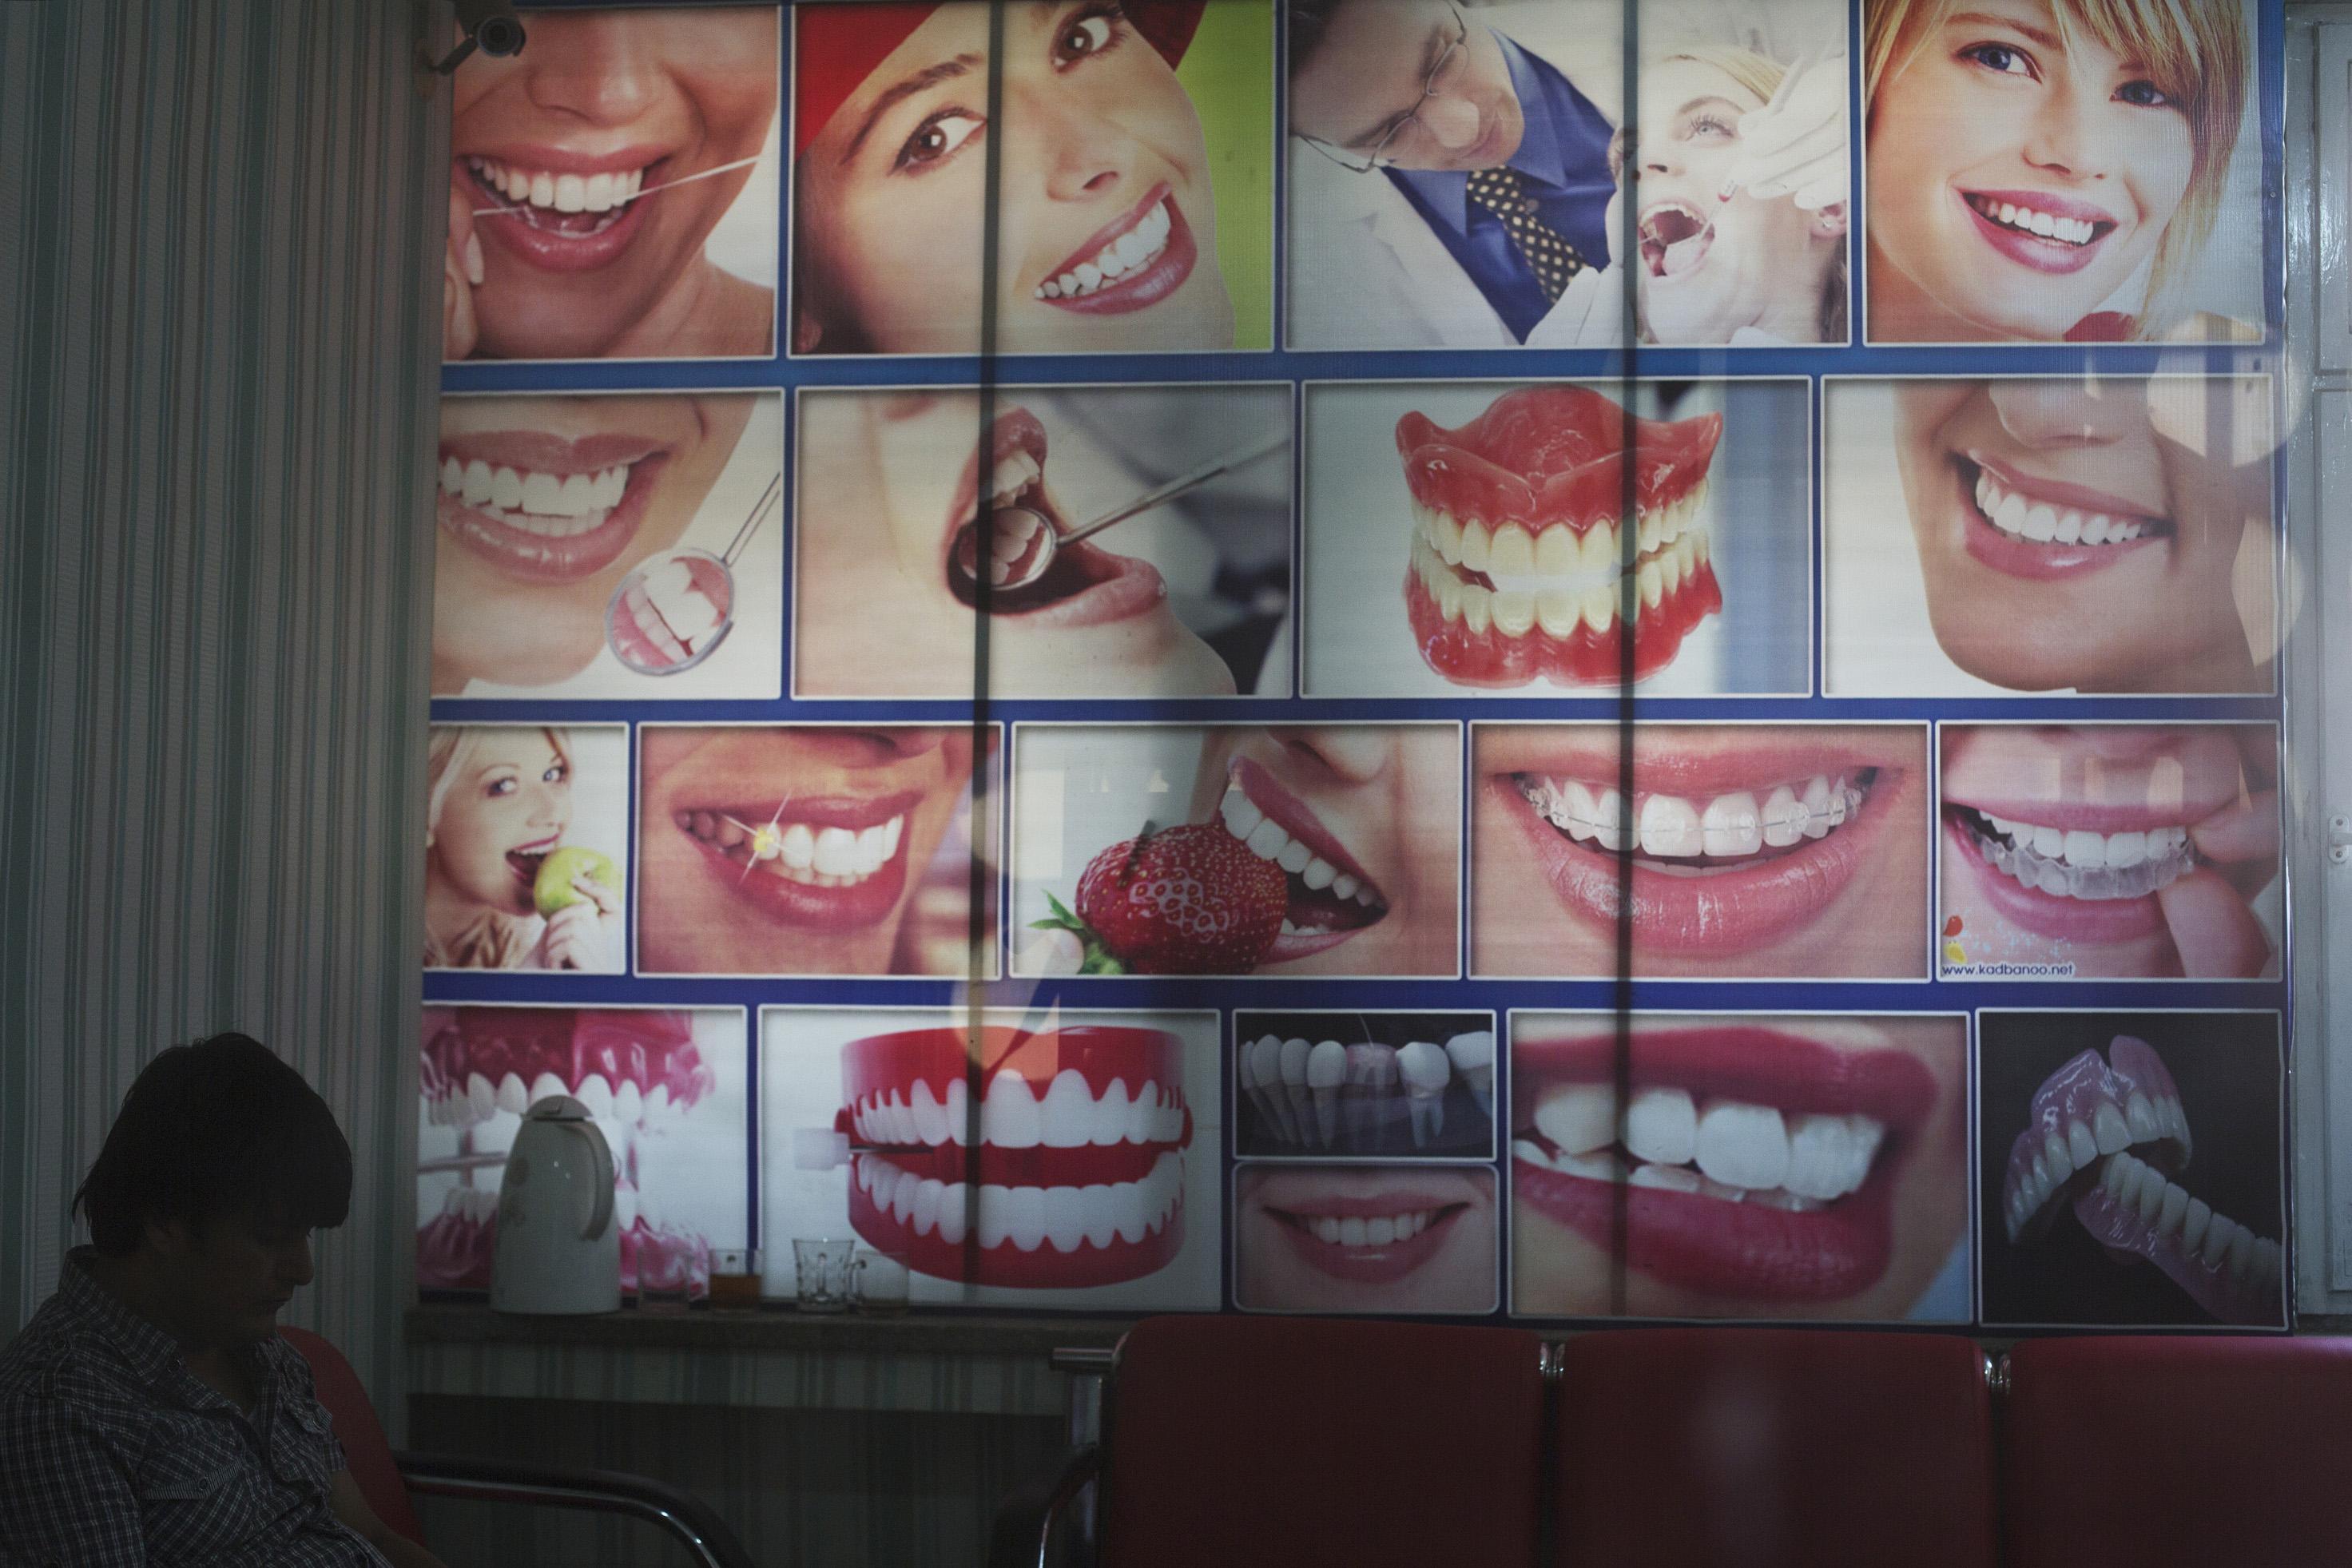 https://assets.sourcemedia.com/5b/72/19ae3a21433fa5d1d1f579547ecd/di-dental-stock-061518.jpg